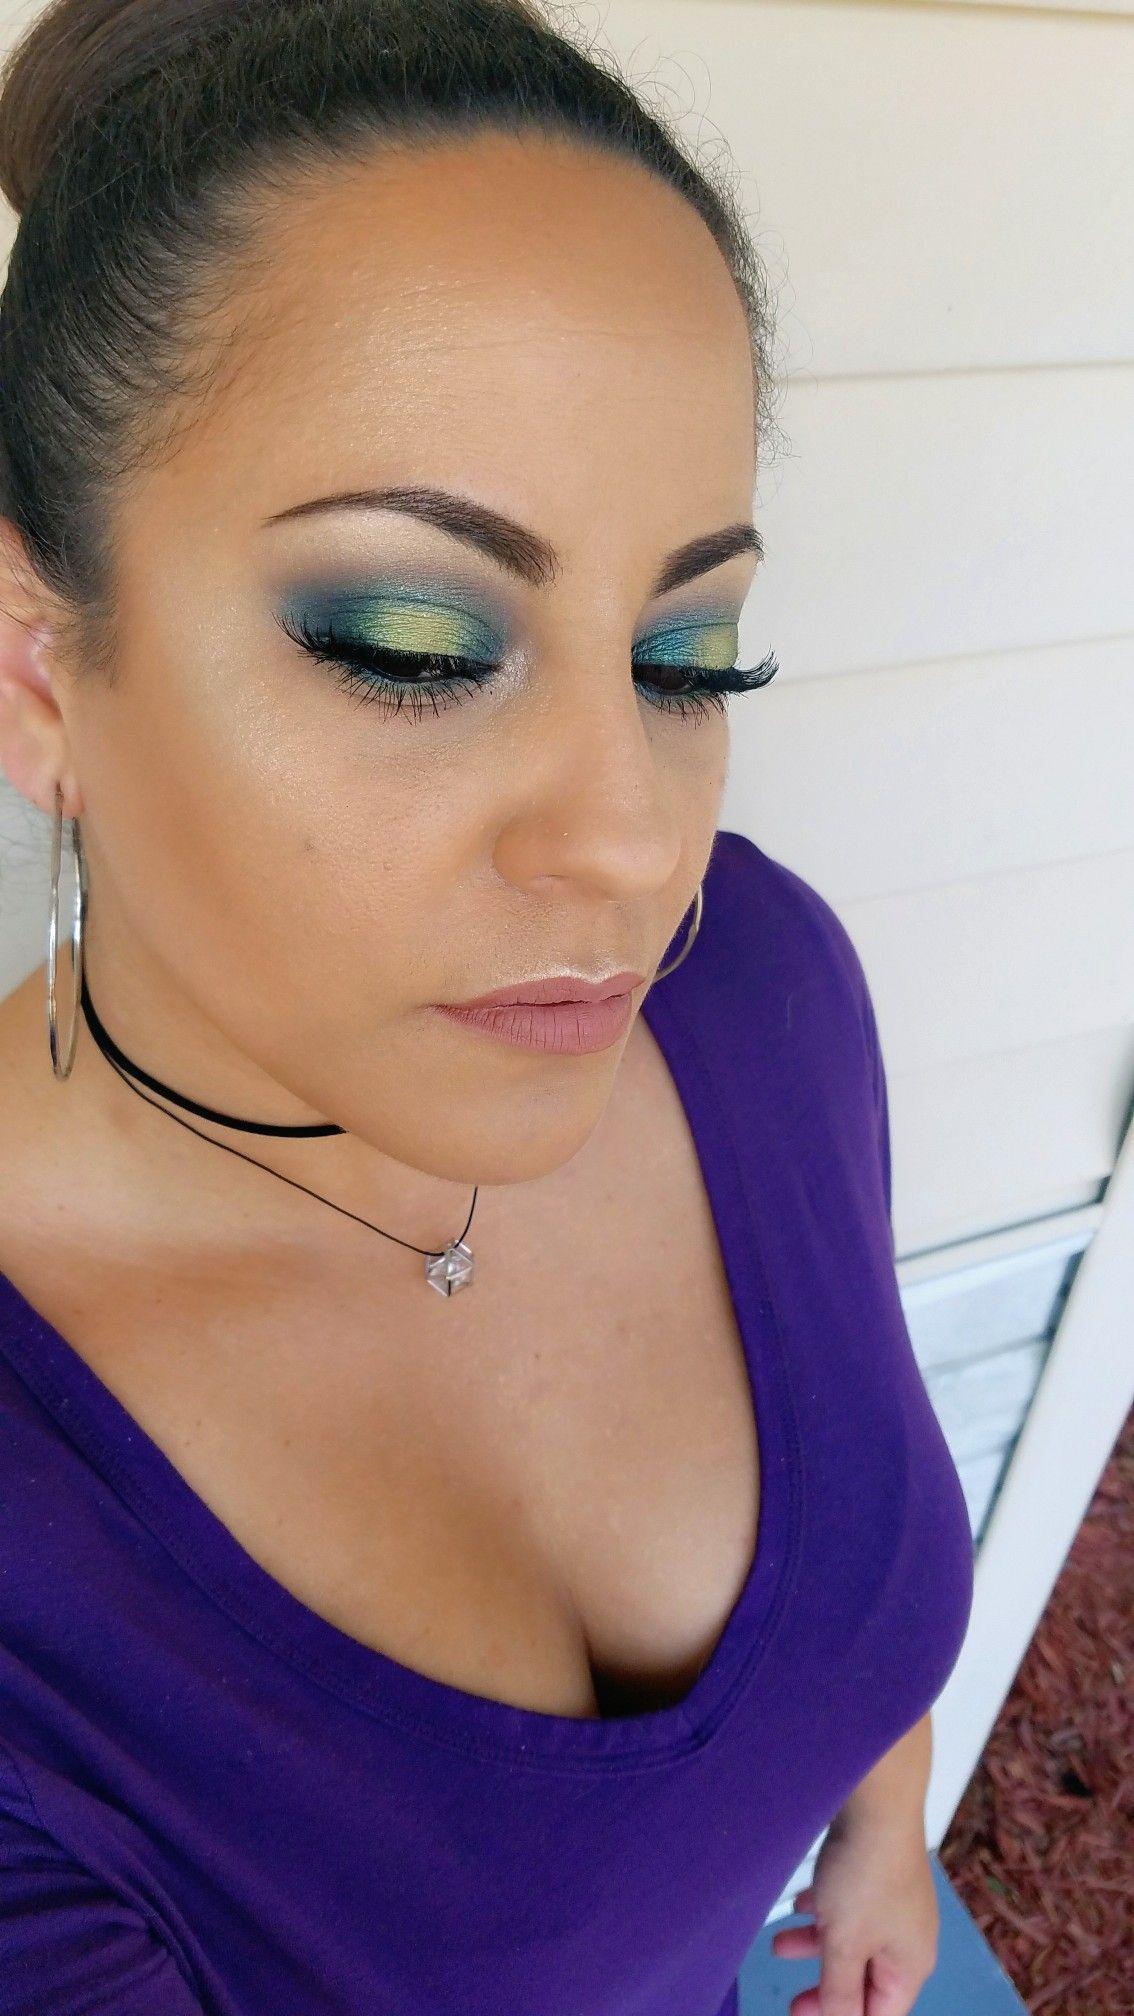 Green halo eye makeup beauty Eyeshadow lashes Instagram